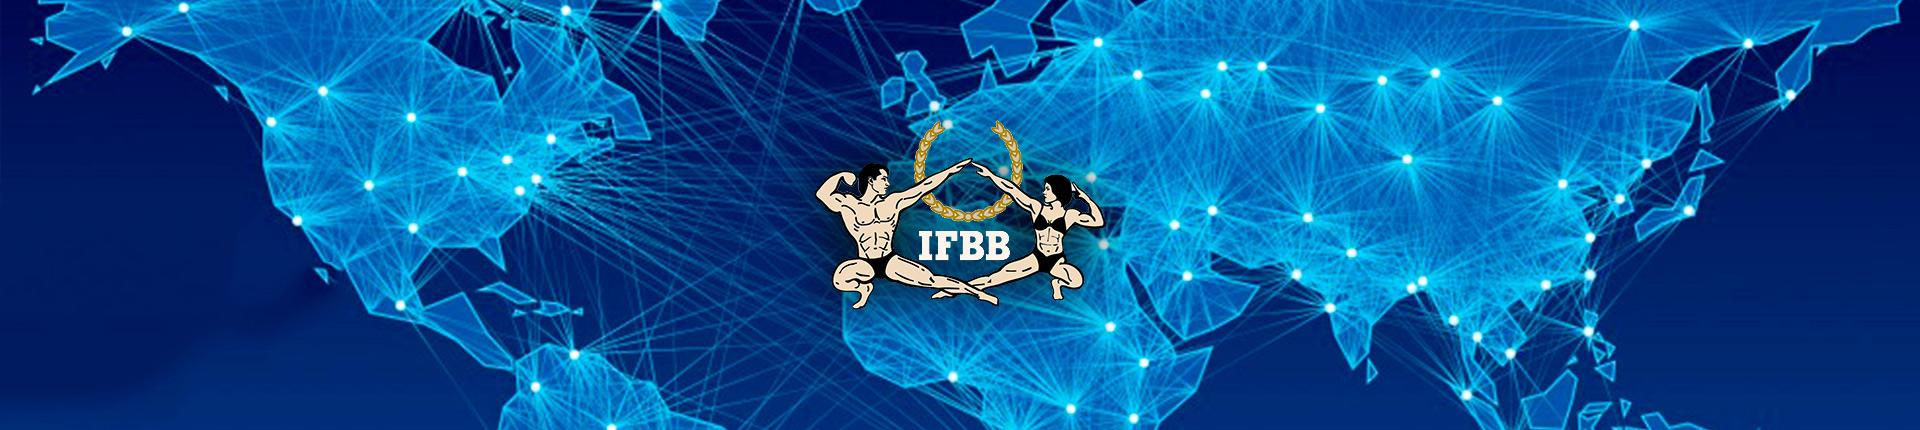 IFBB Diamond Cup tuż za polską granicą